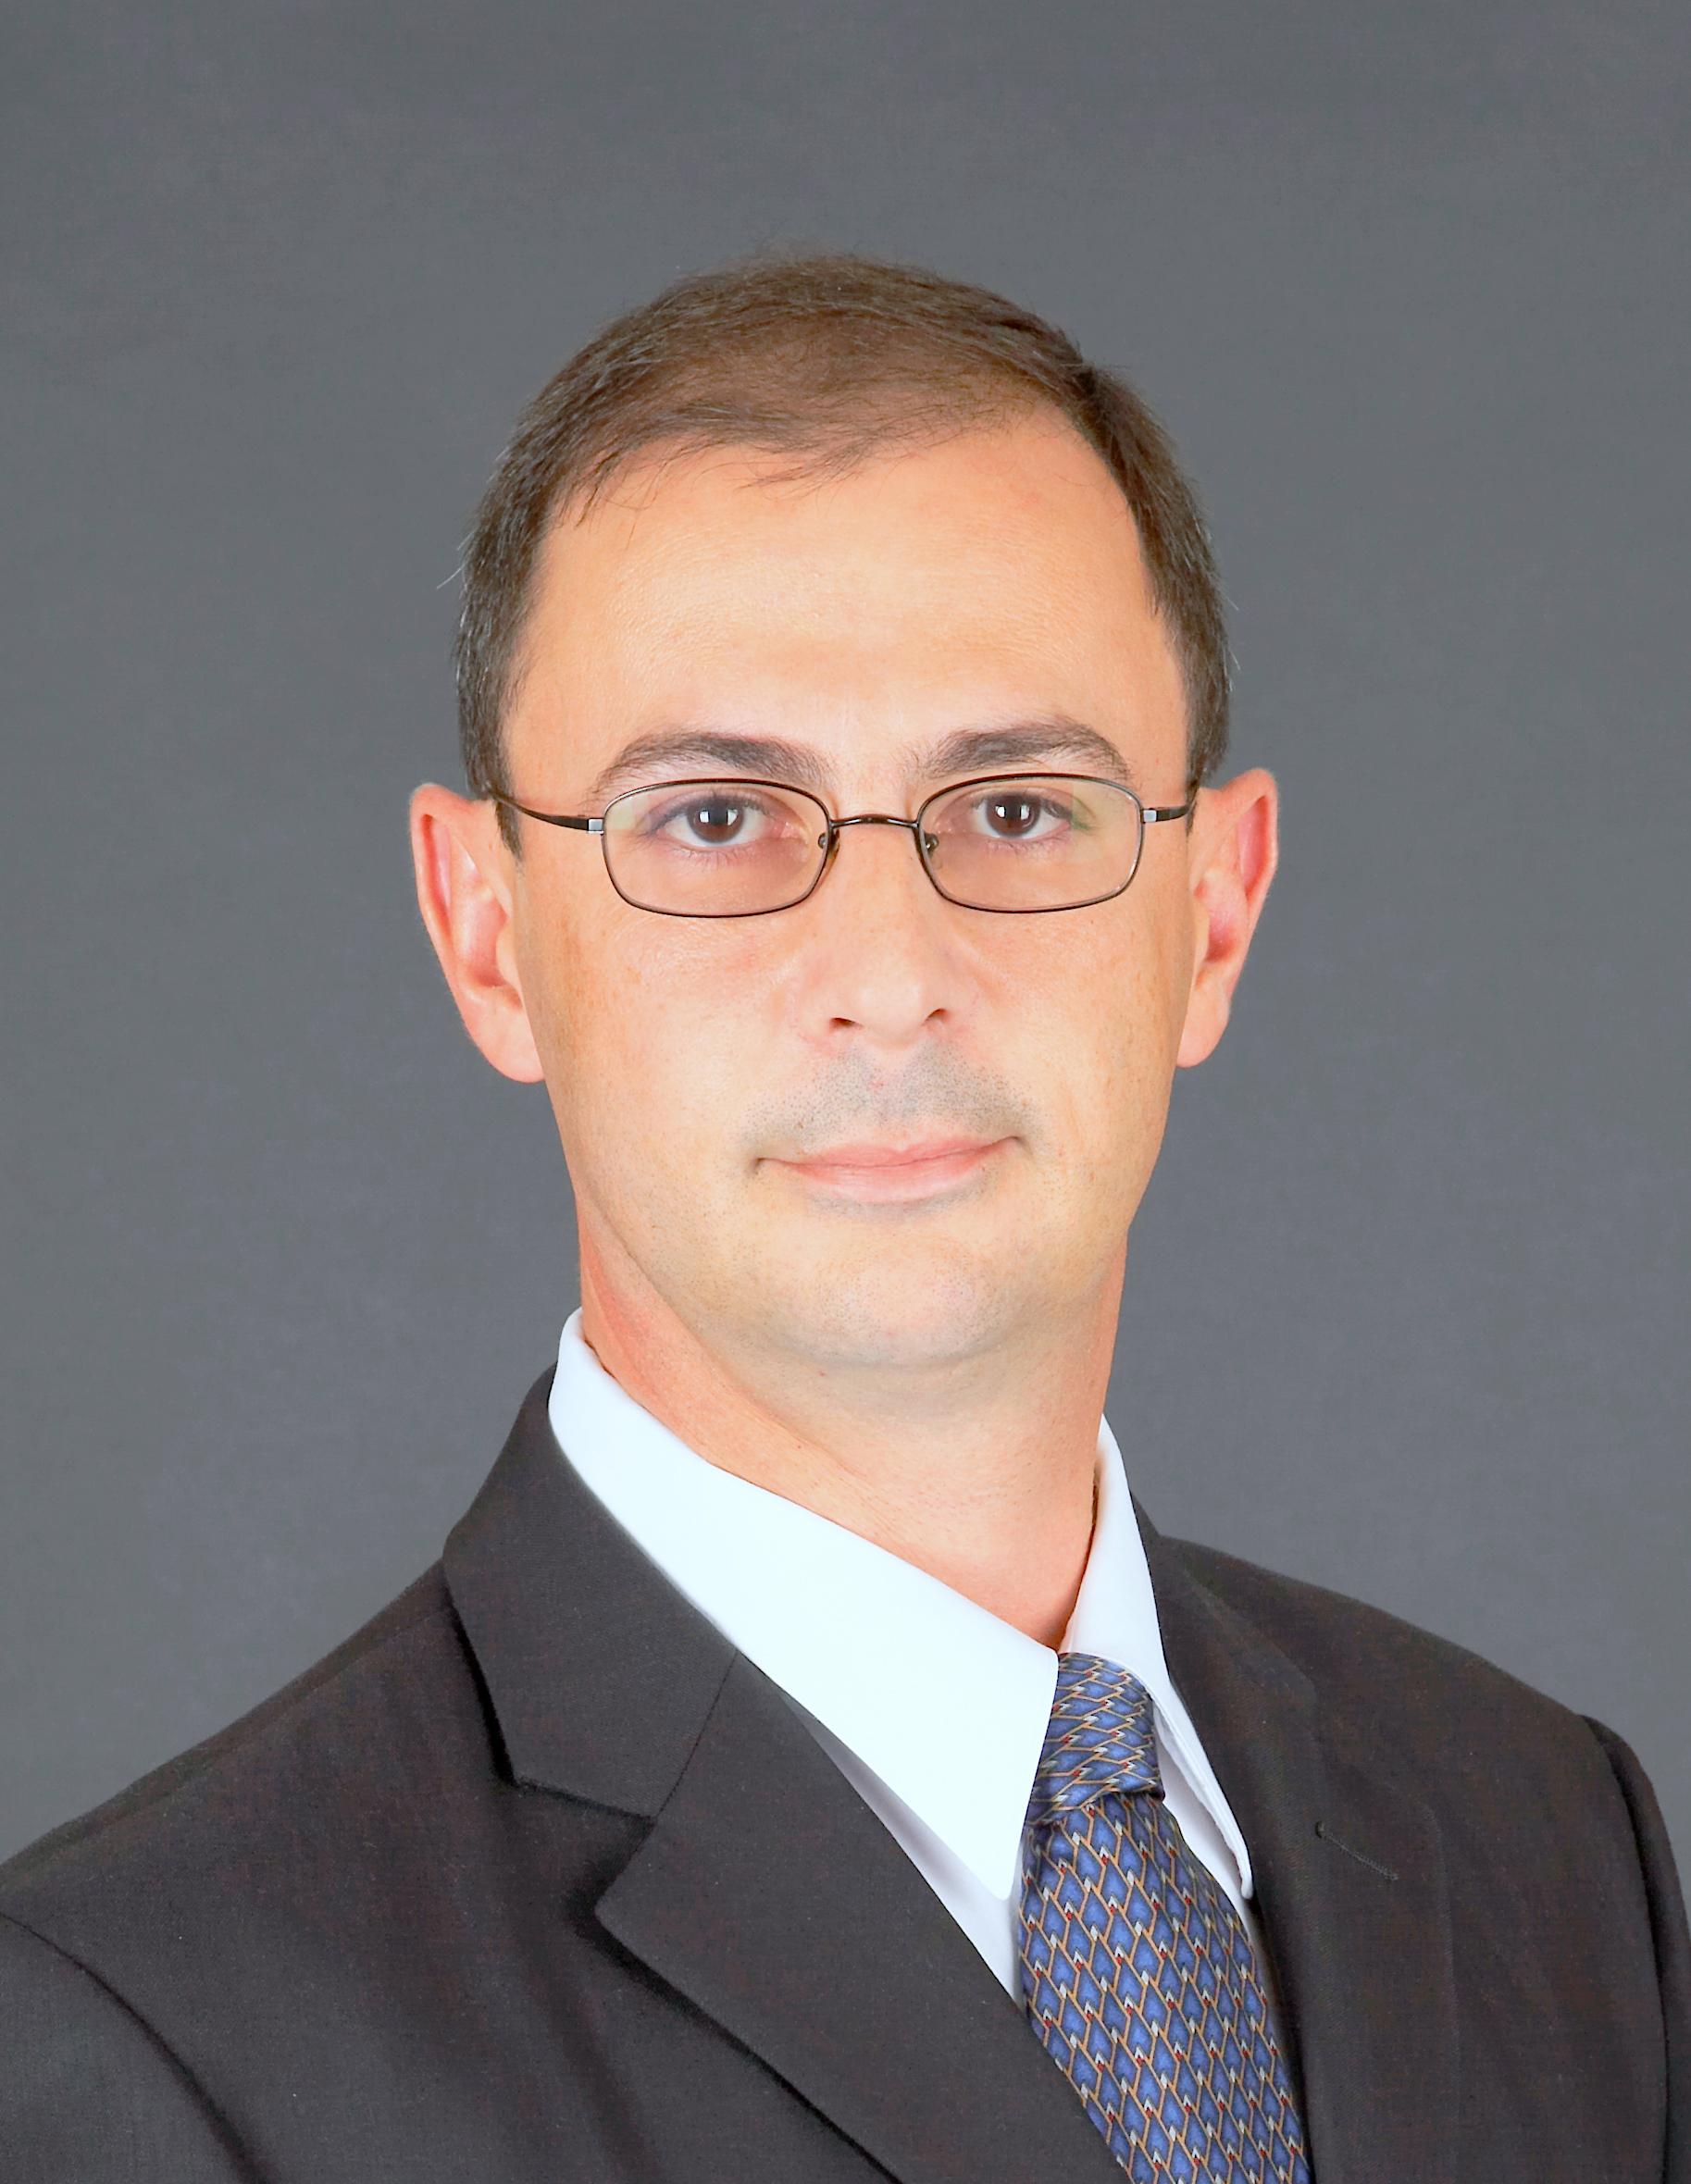 Olivier Dapremont